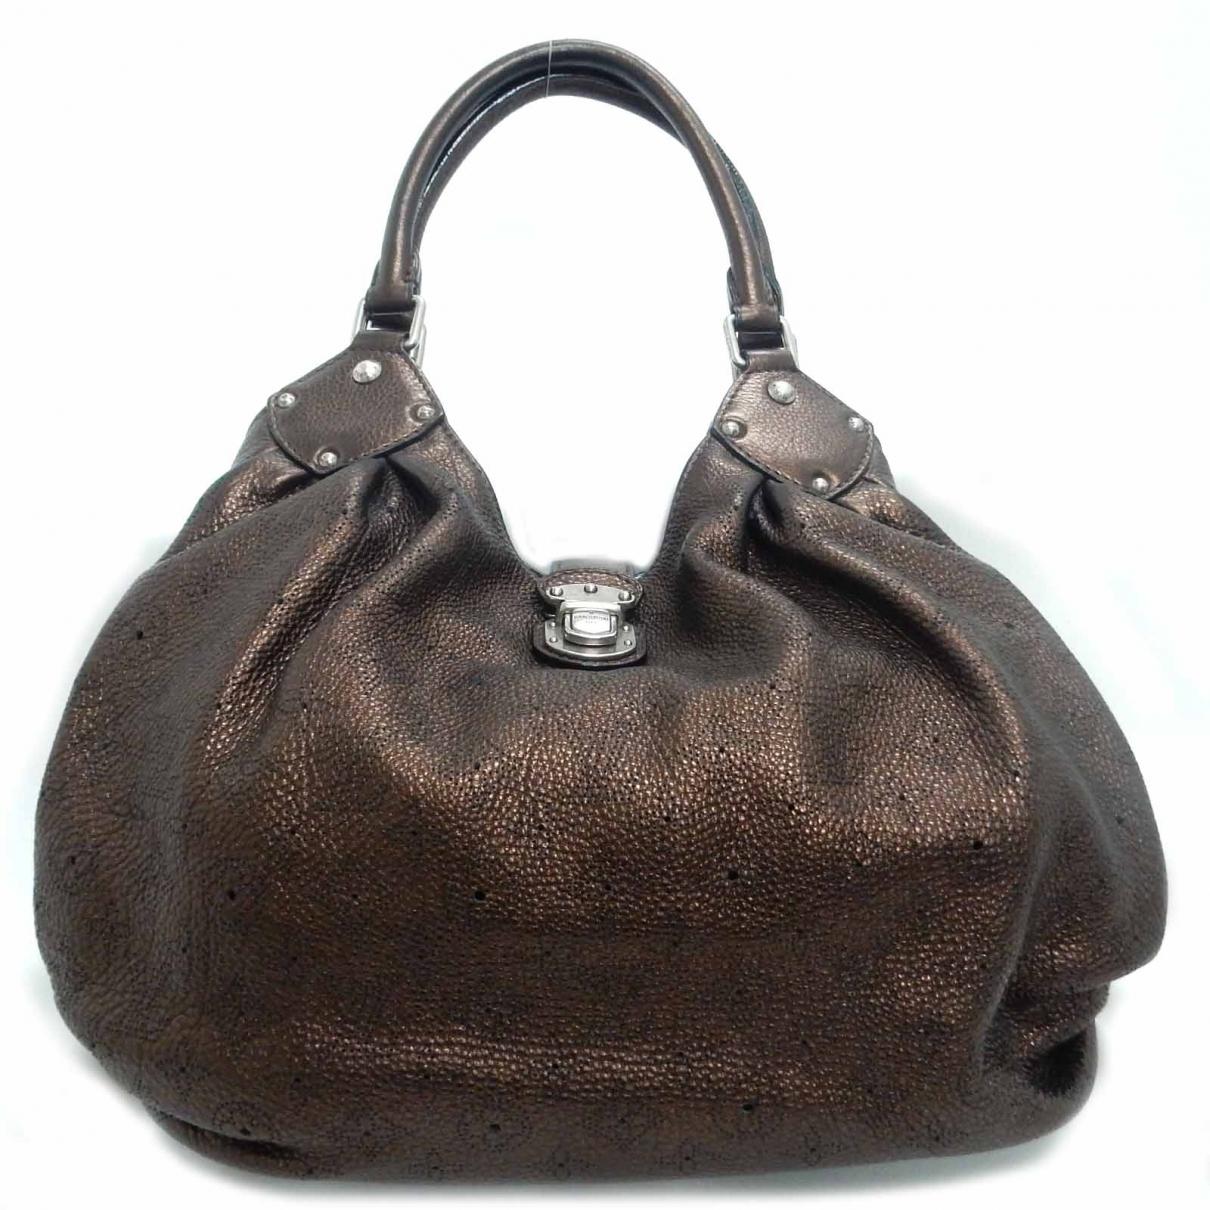 Louis Vuitton - Sac a main Mahina pour femme en cuir - marron